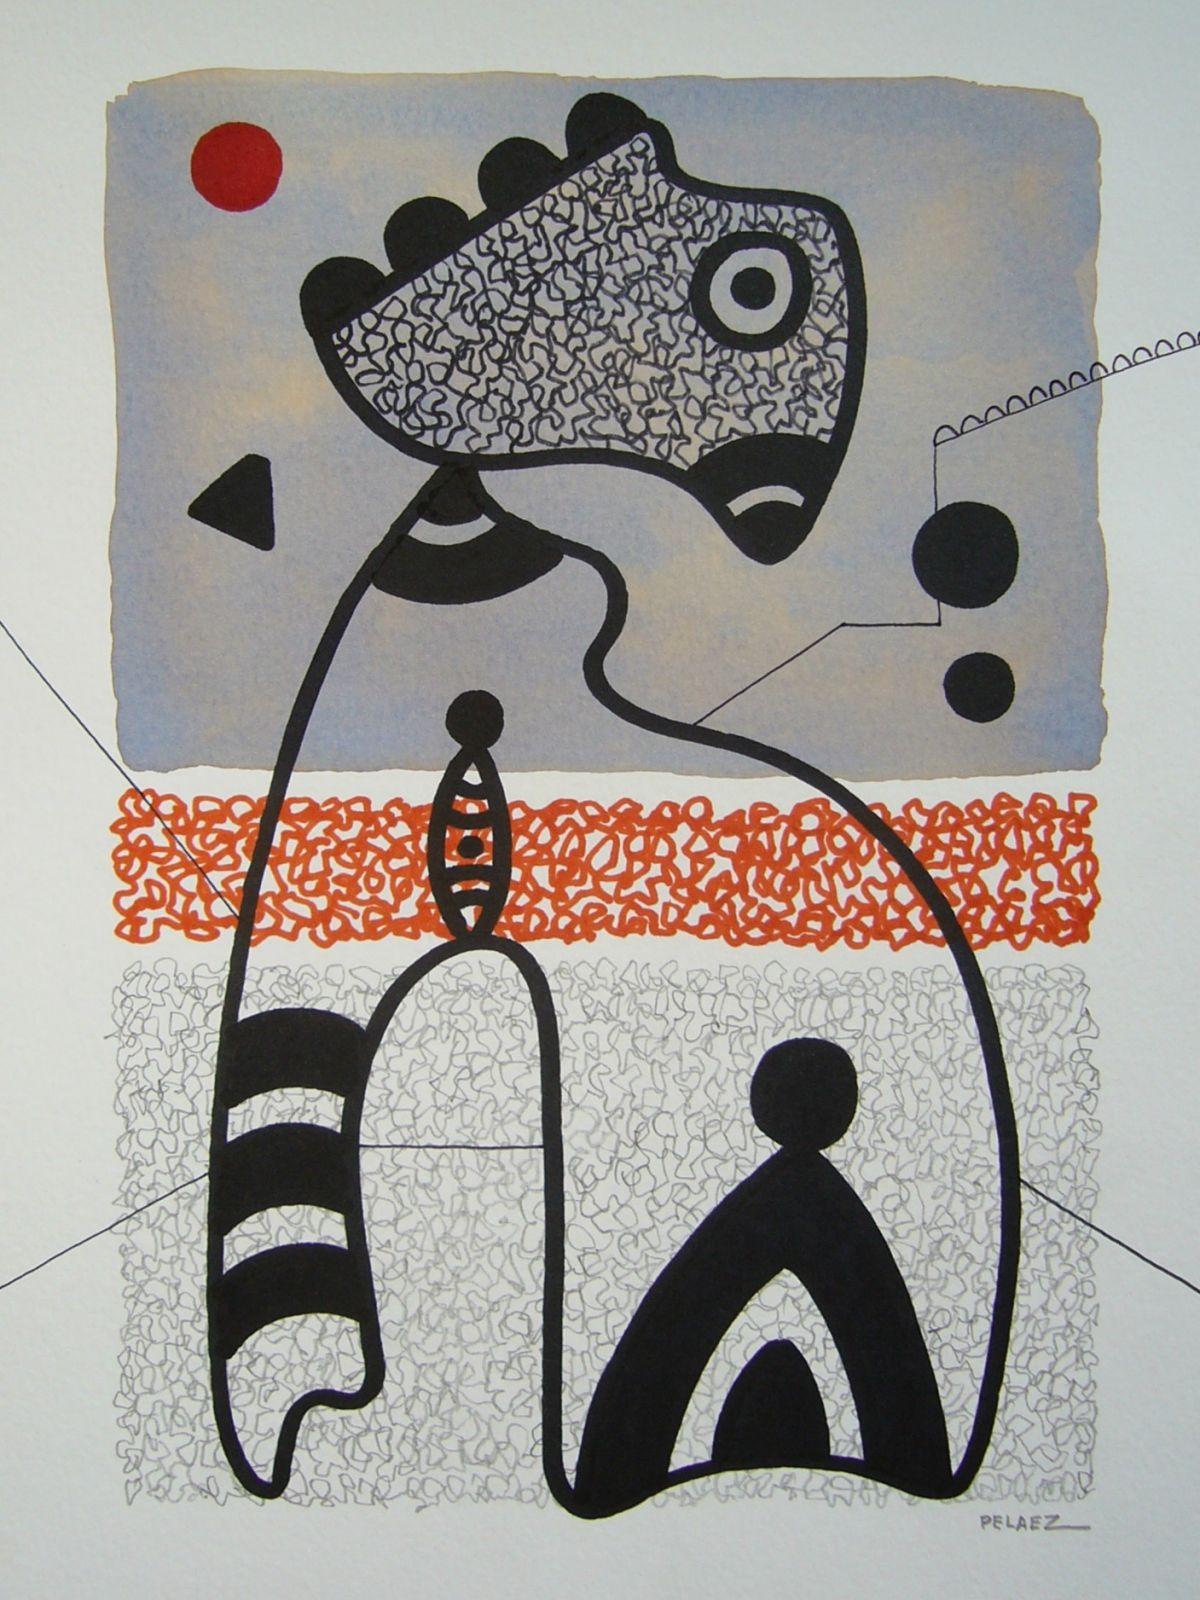 Linea Punto Forma Y Color Jose Gabriel Pelaez Ibanez Www Galerias Arte Com Dibujos De Puntos Proyectos De Arte Para Ninos Proyectos De Arte